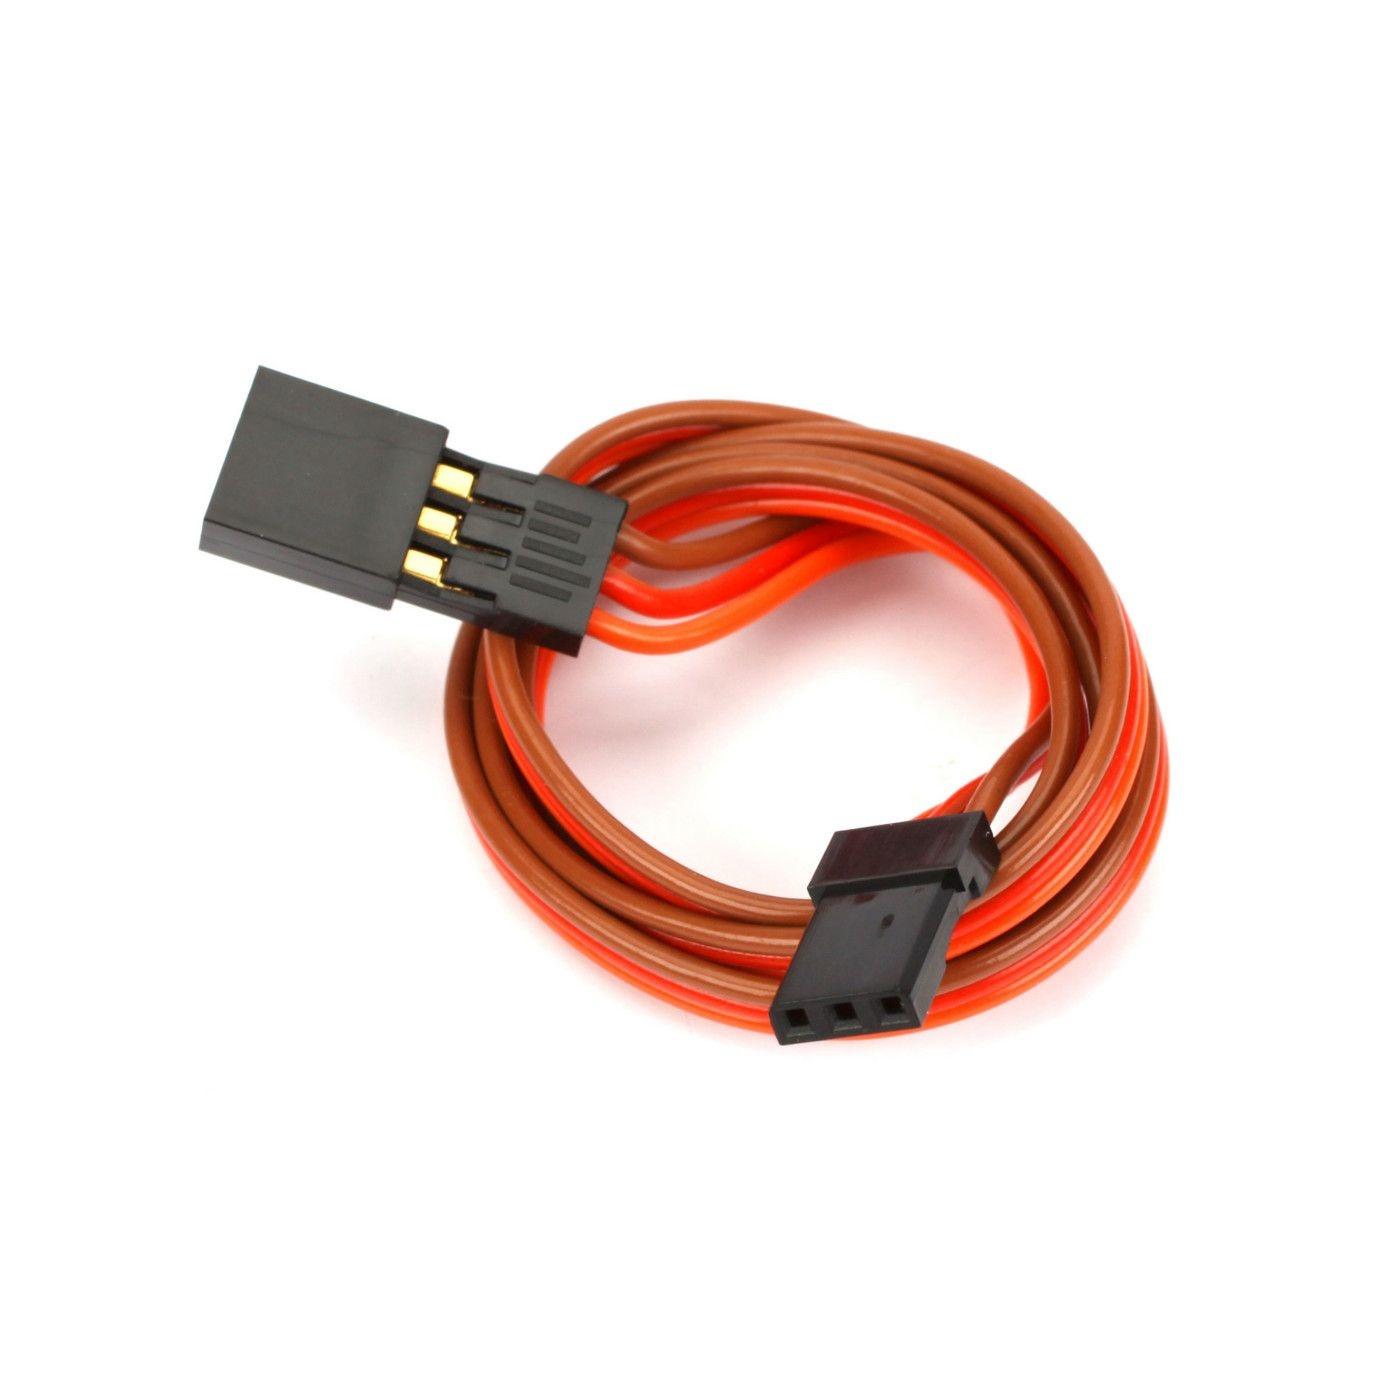 TQ Power TQWM2205 2205 TP 4S Bal Ext Cable 600mm